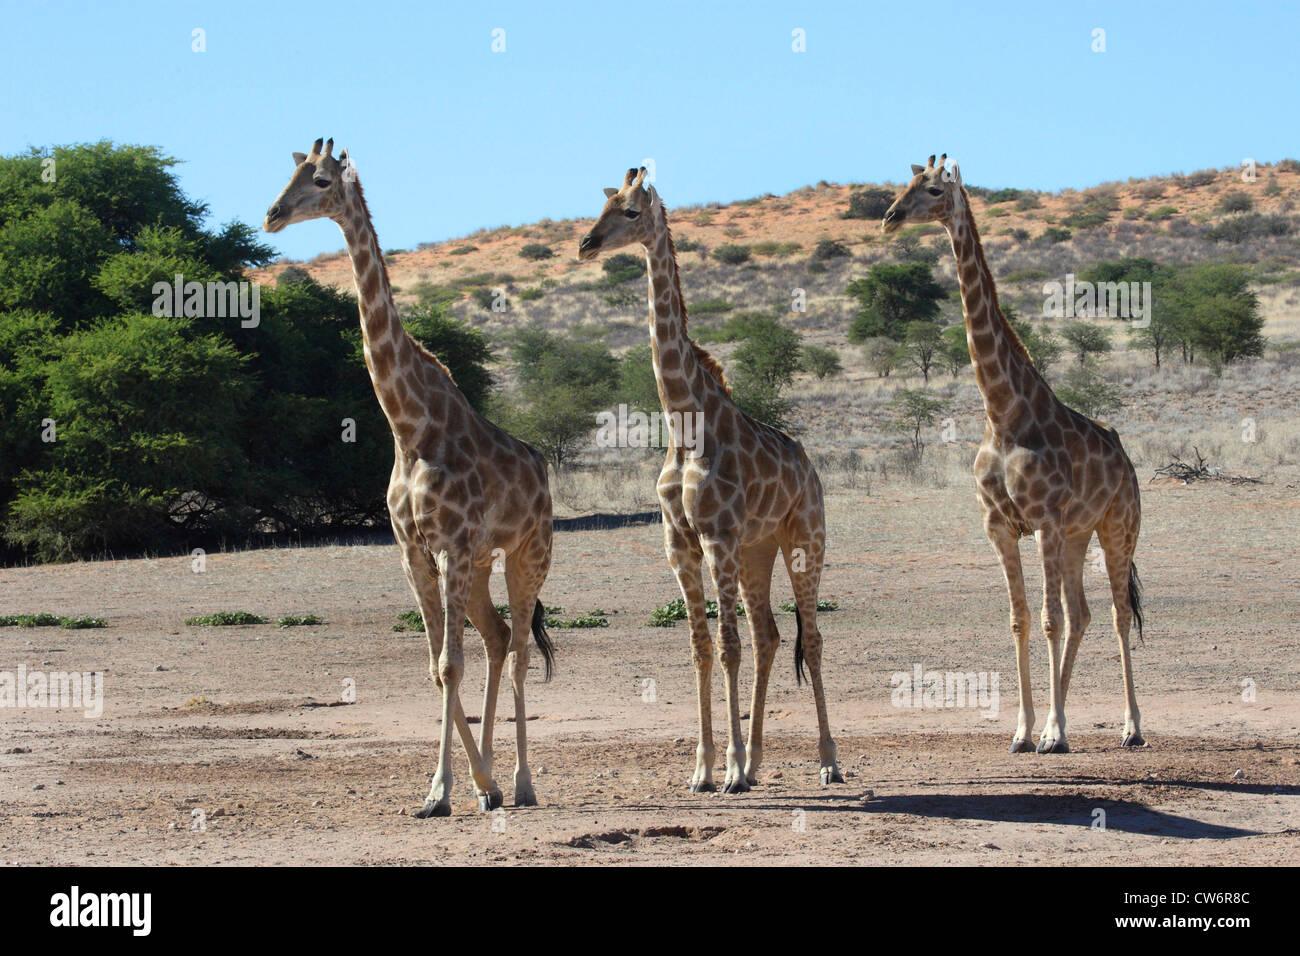 giraffe (Giraffa camelopardalis), three animals walking through the steppe side by side, South Africa, Kgalagadi - Stock Image